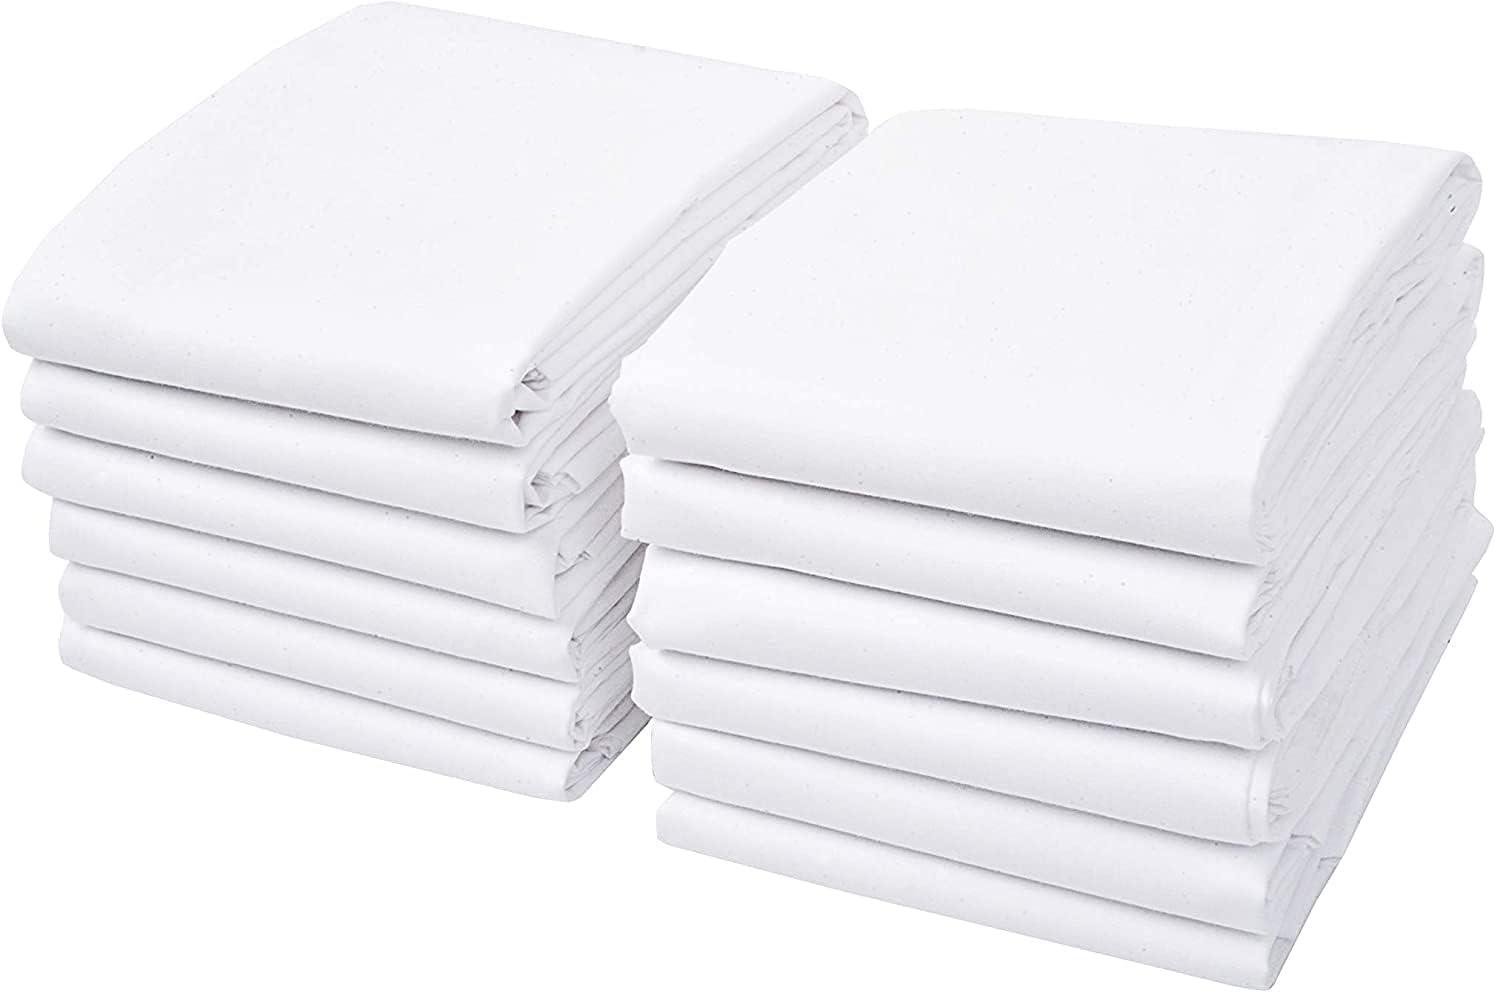 Linteum Textile White Cotton Pillowcases T- Standard Set – 毎日激安特売で 営業中です 驚きの値段 Size